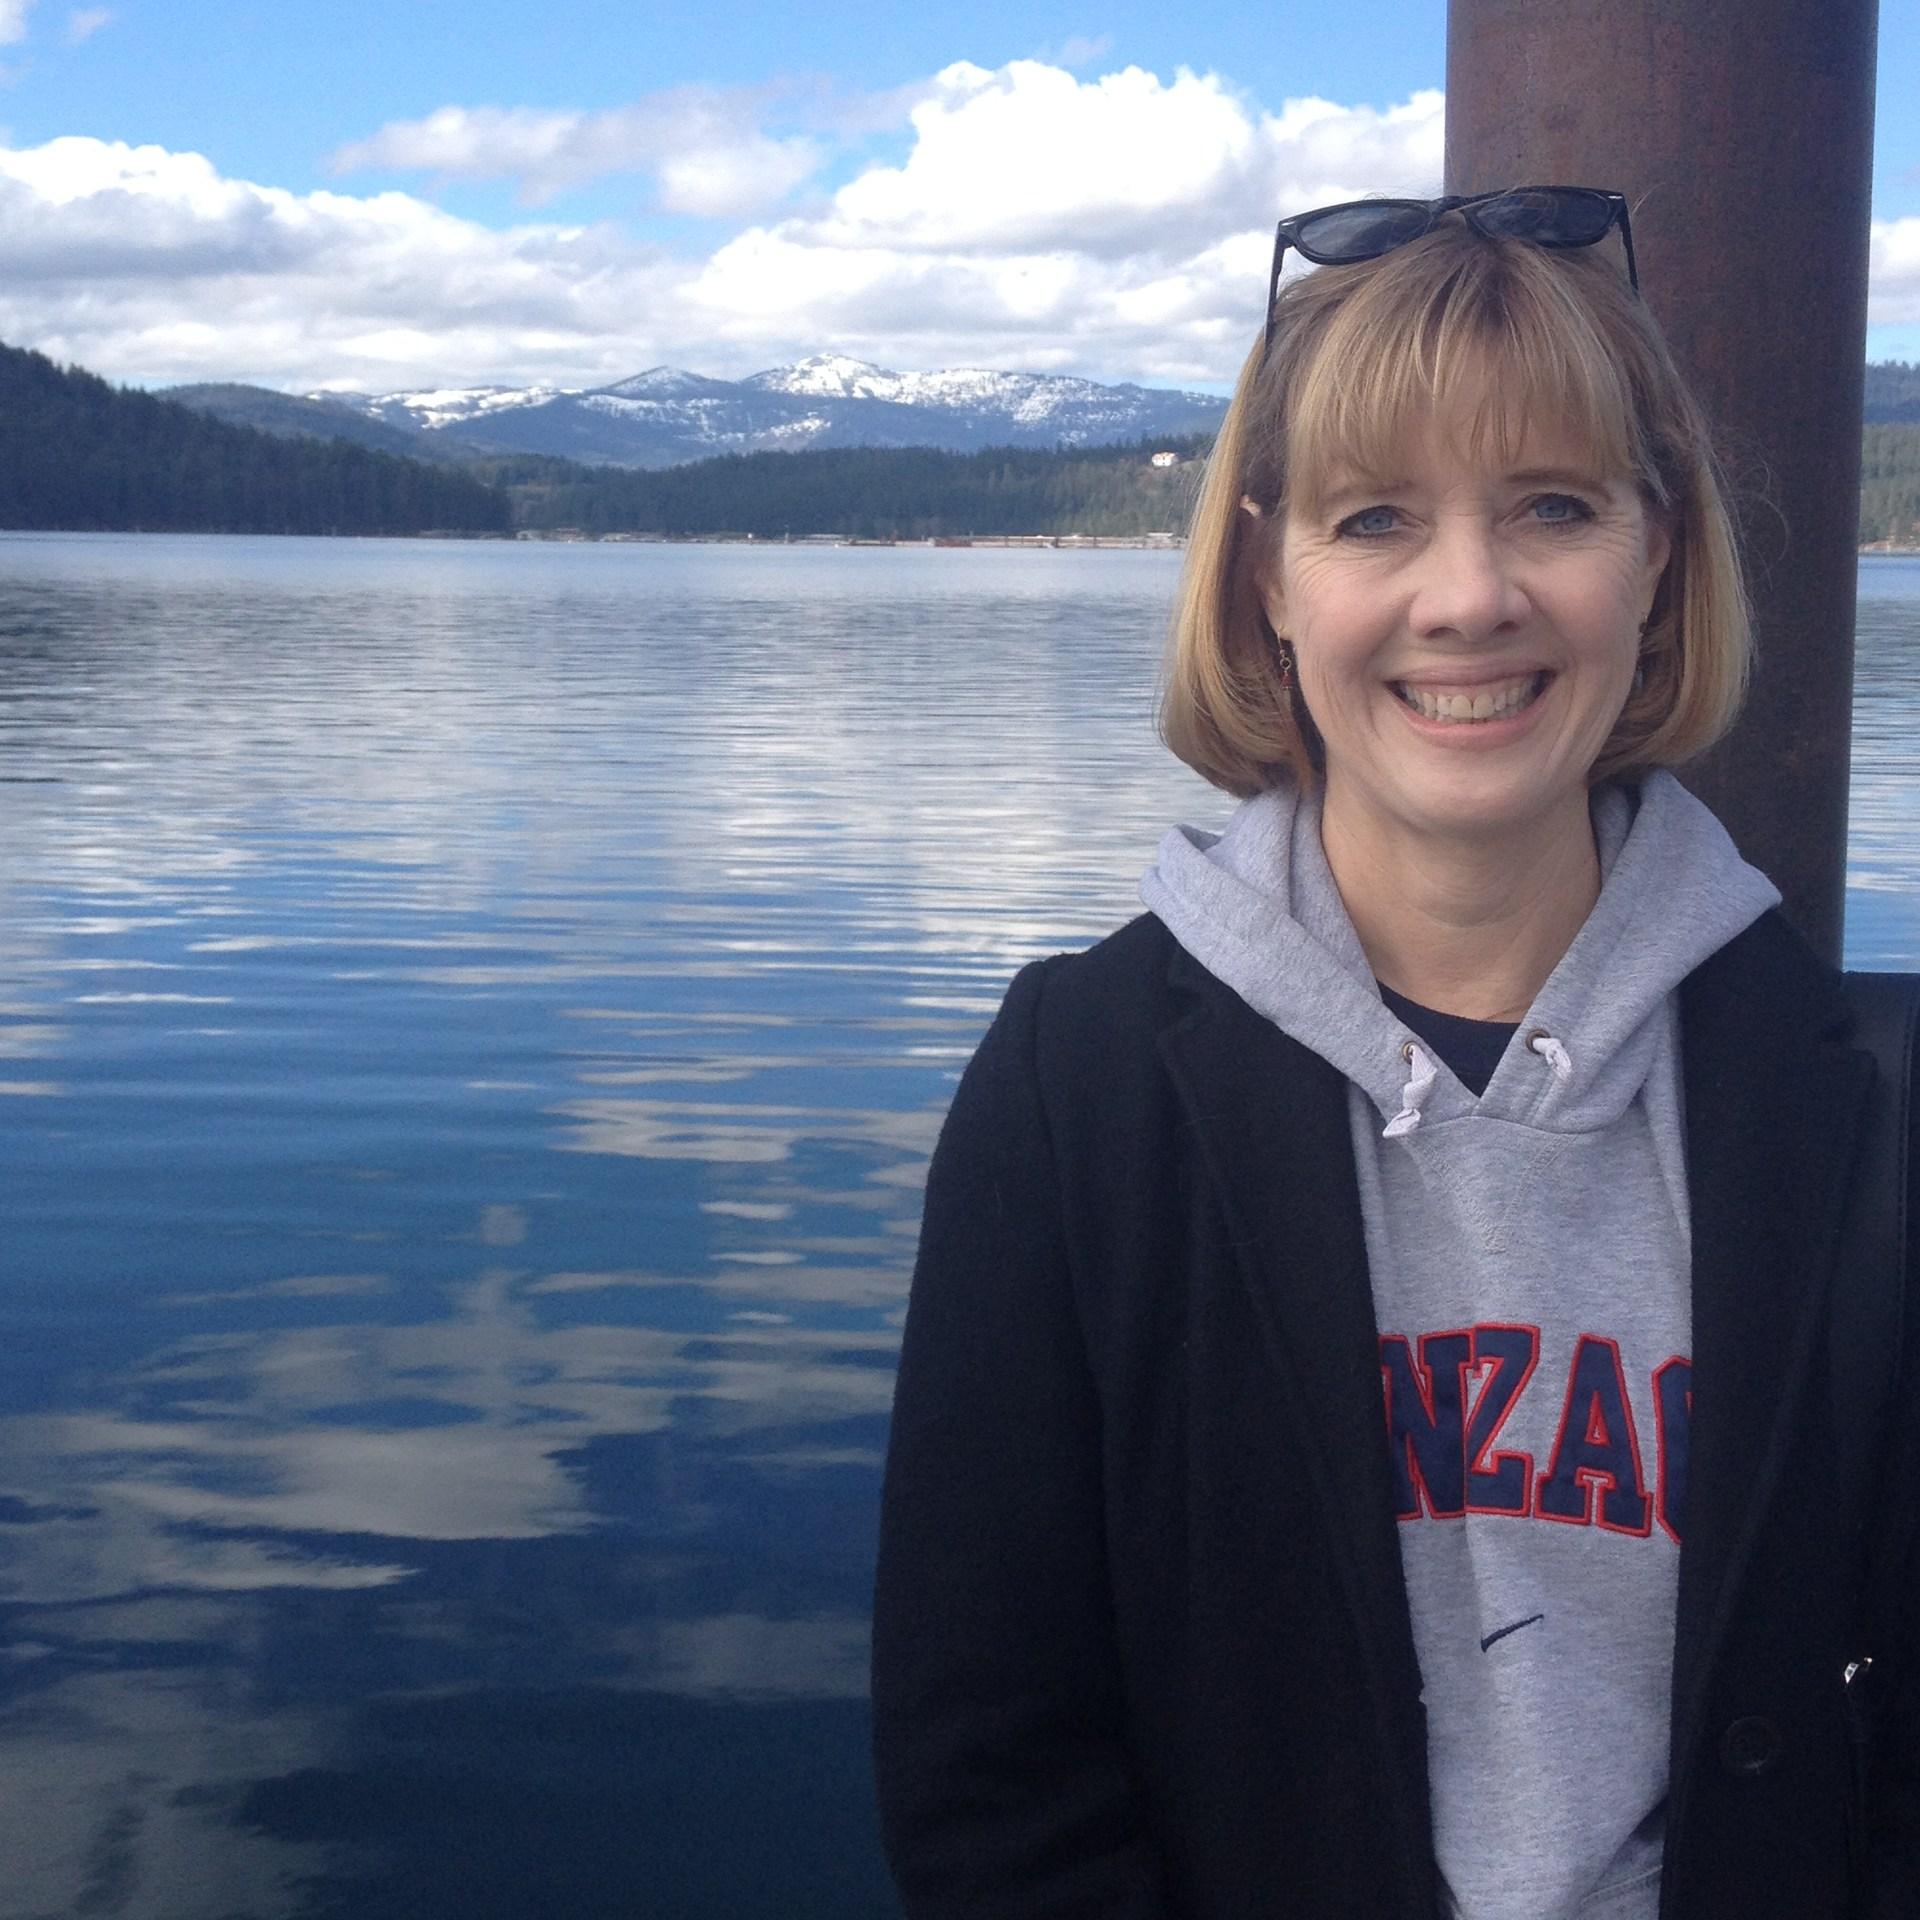 Mrs. Davies in Coeur D'Alene, Idaho.